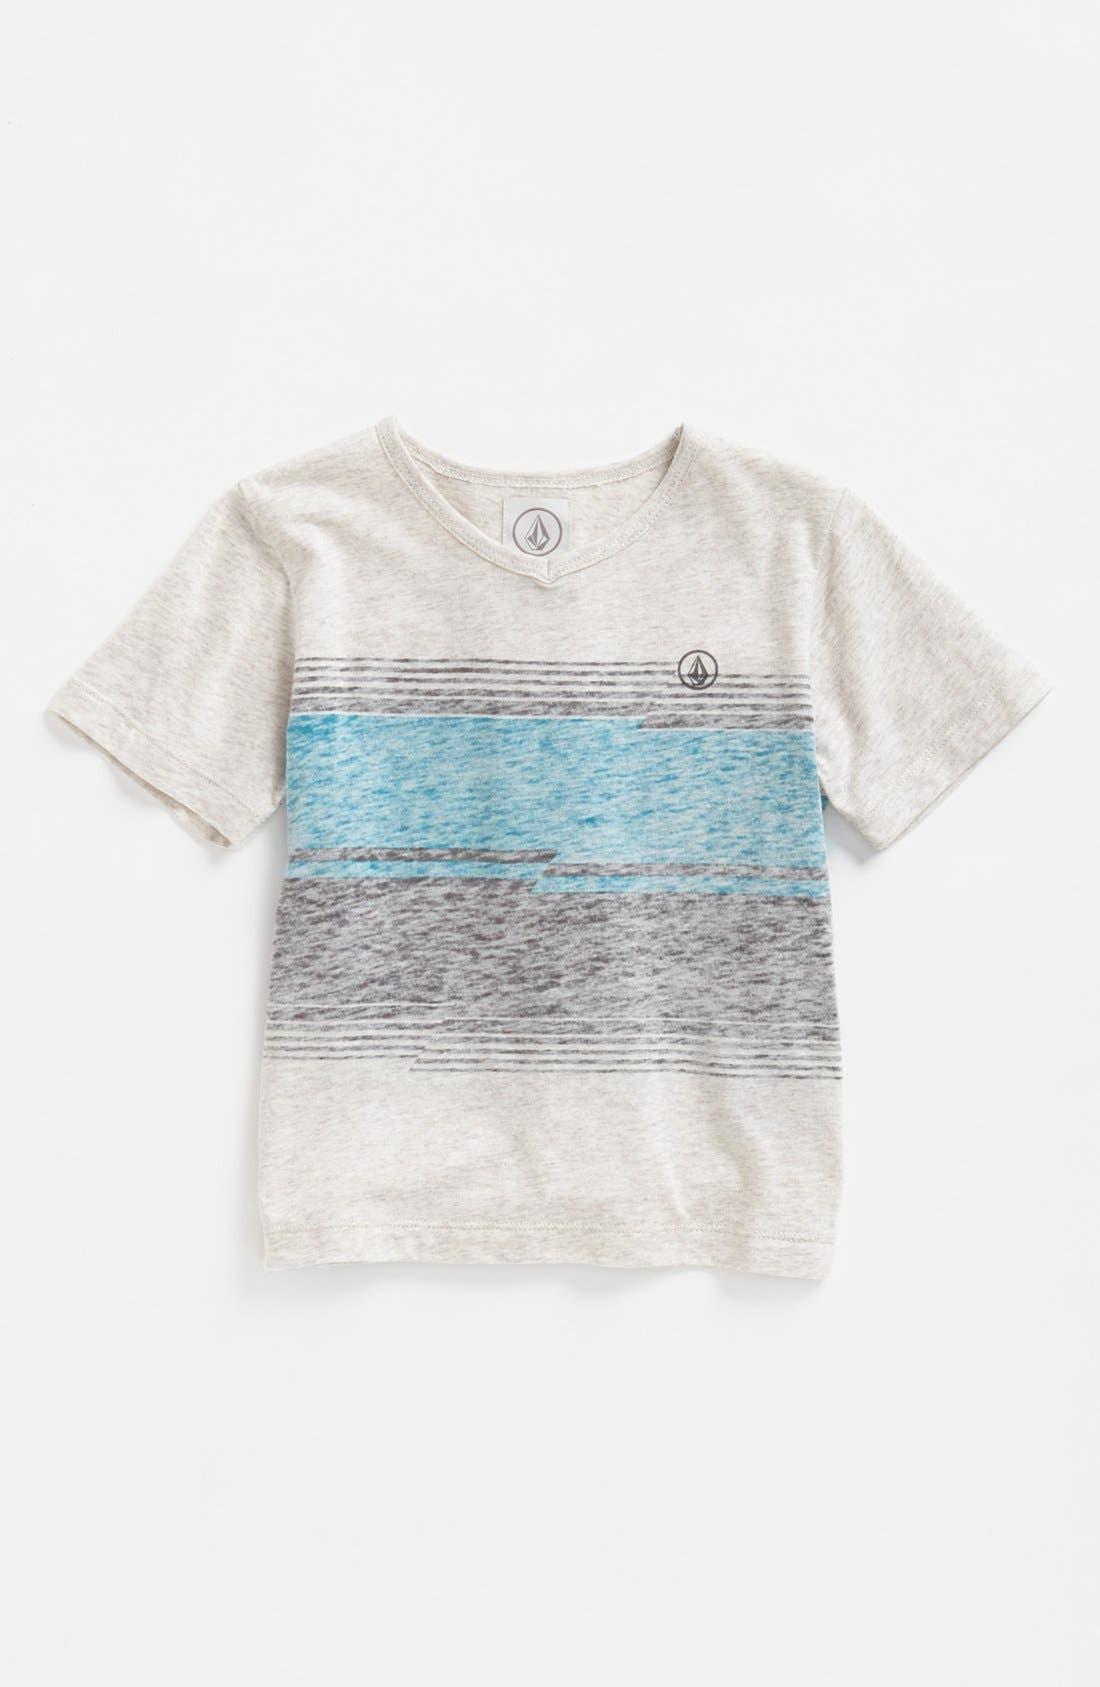 Main Image - Volcom 'Inferno' V-Neck T-Shirt (Toddler Boys)